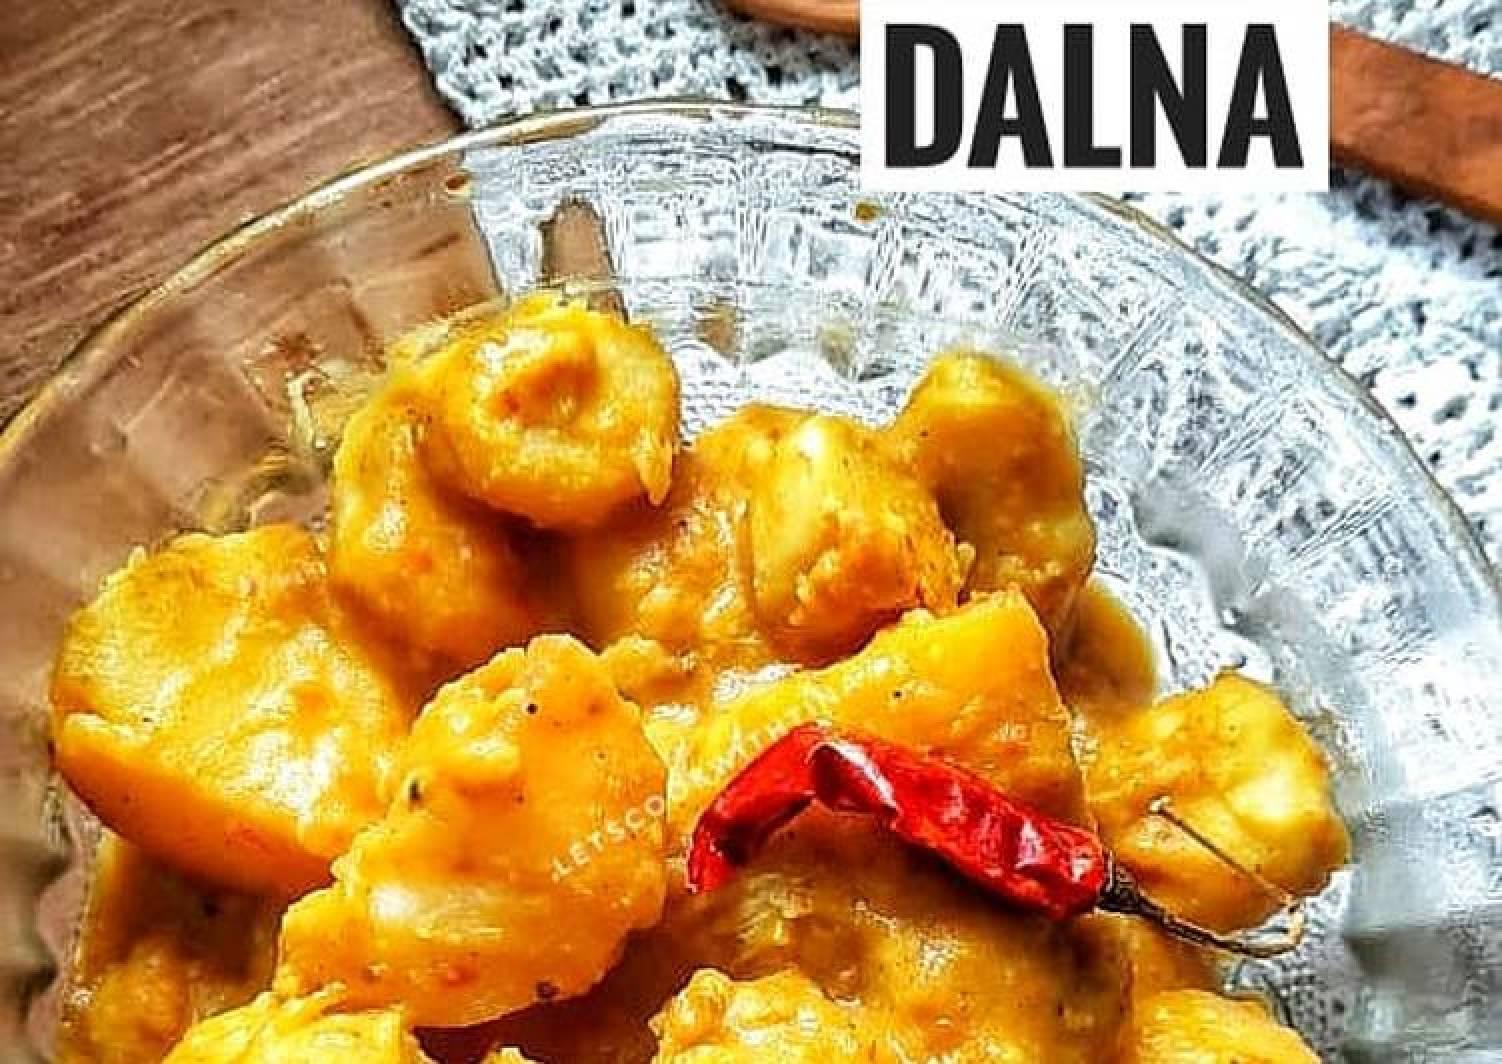 Gathi Kochur Dalna Arbi Curry